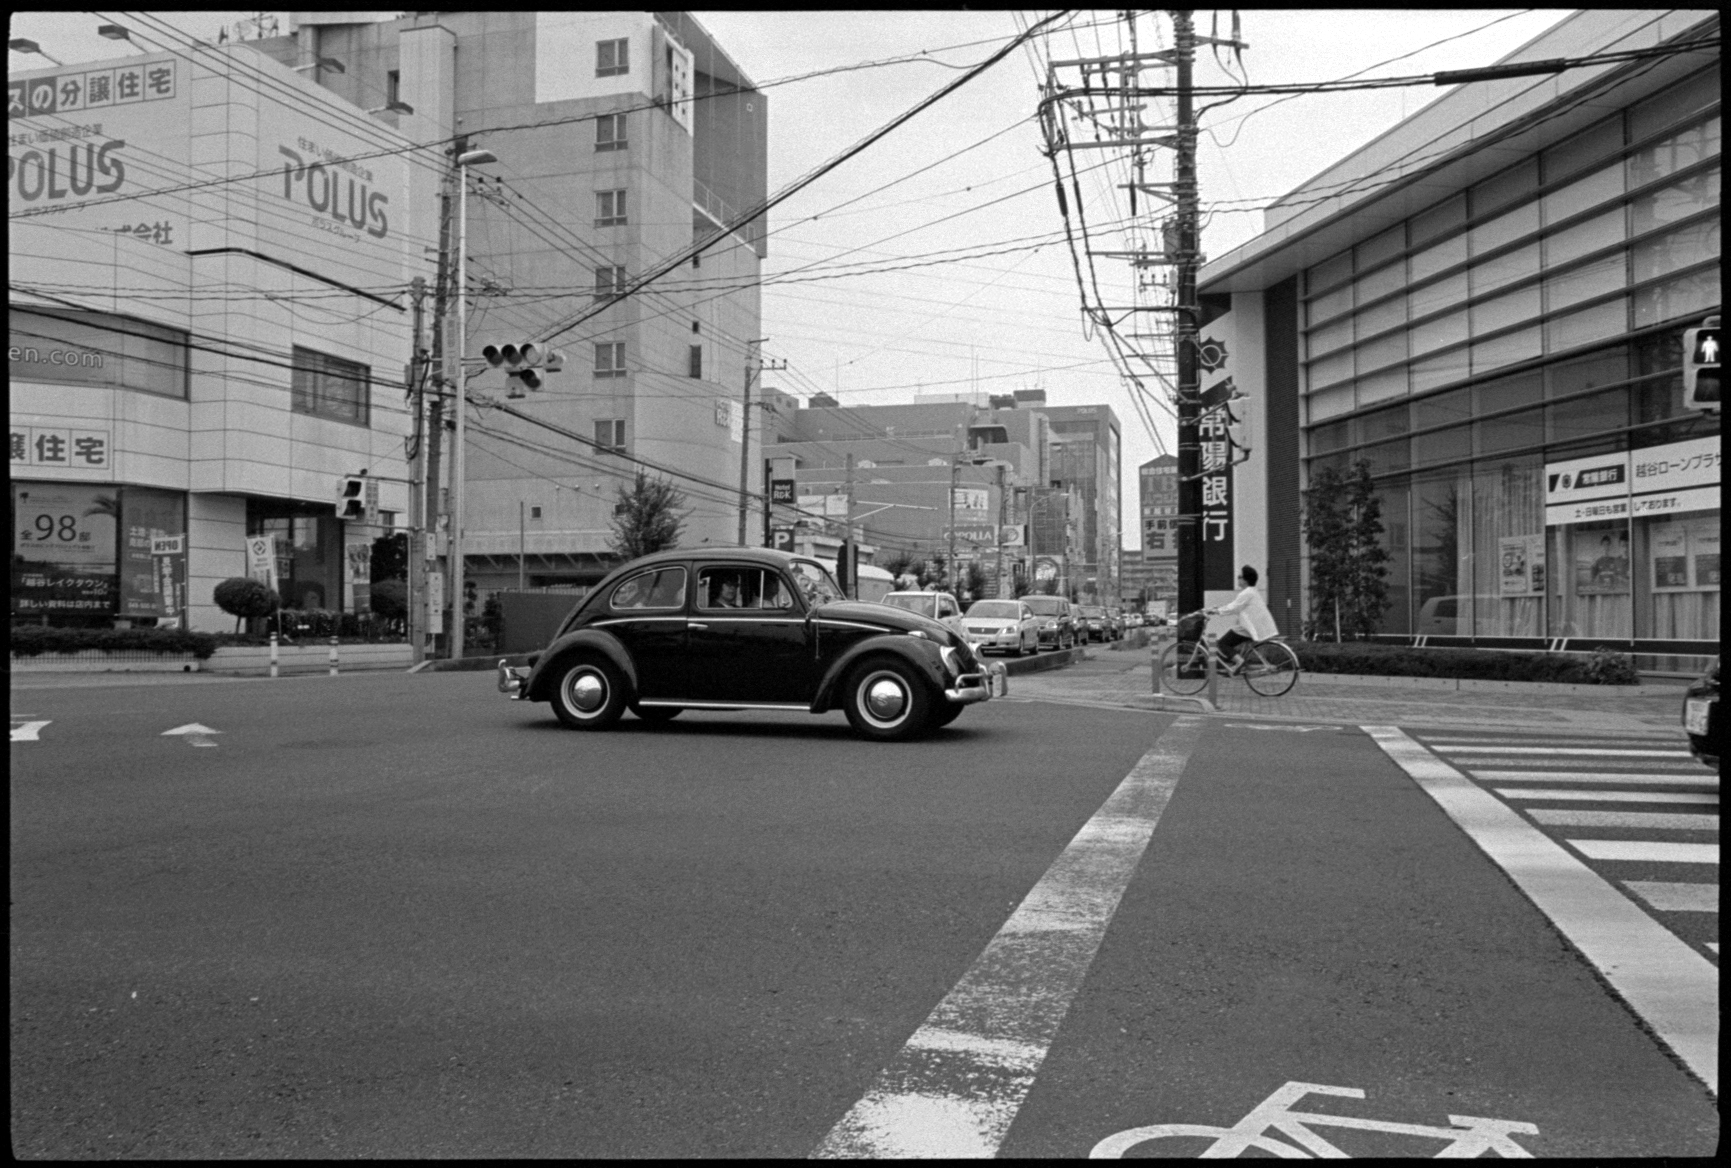 20140814 LeicaM4-P elmarit28 400TX D76 019